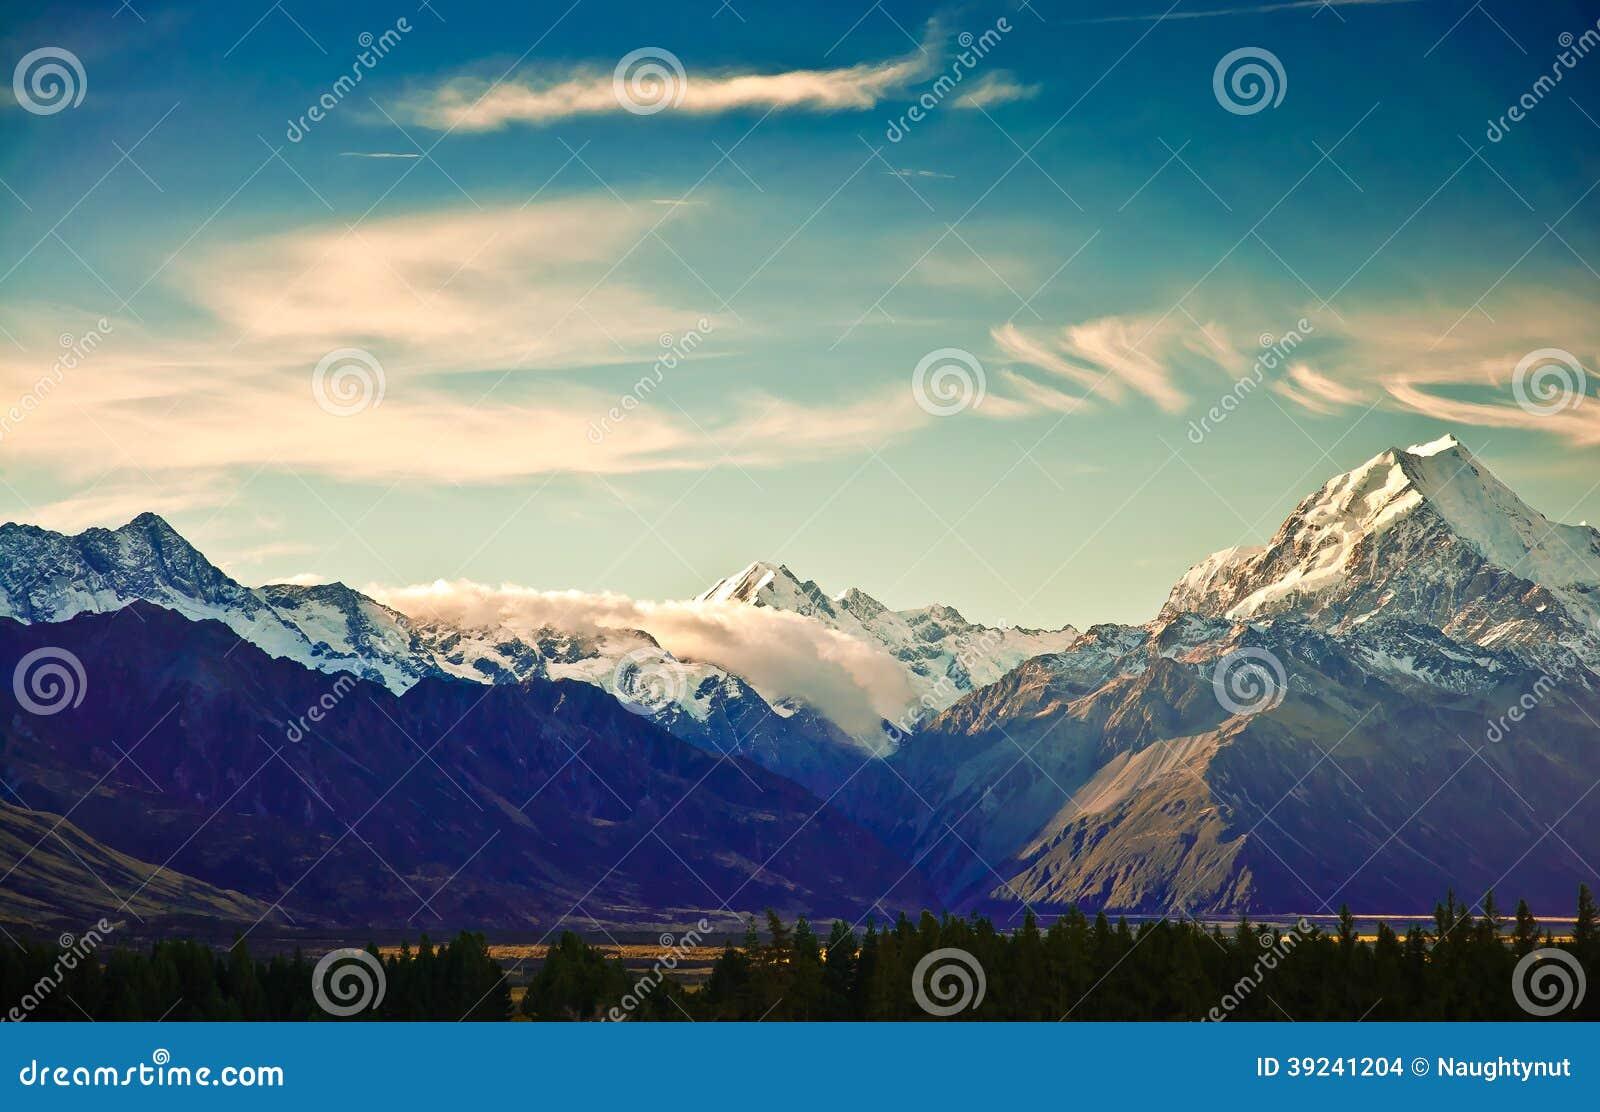 New Zealand scenic mountain landscape